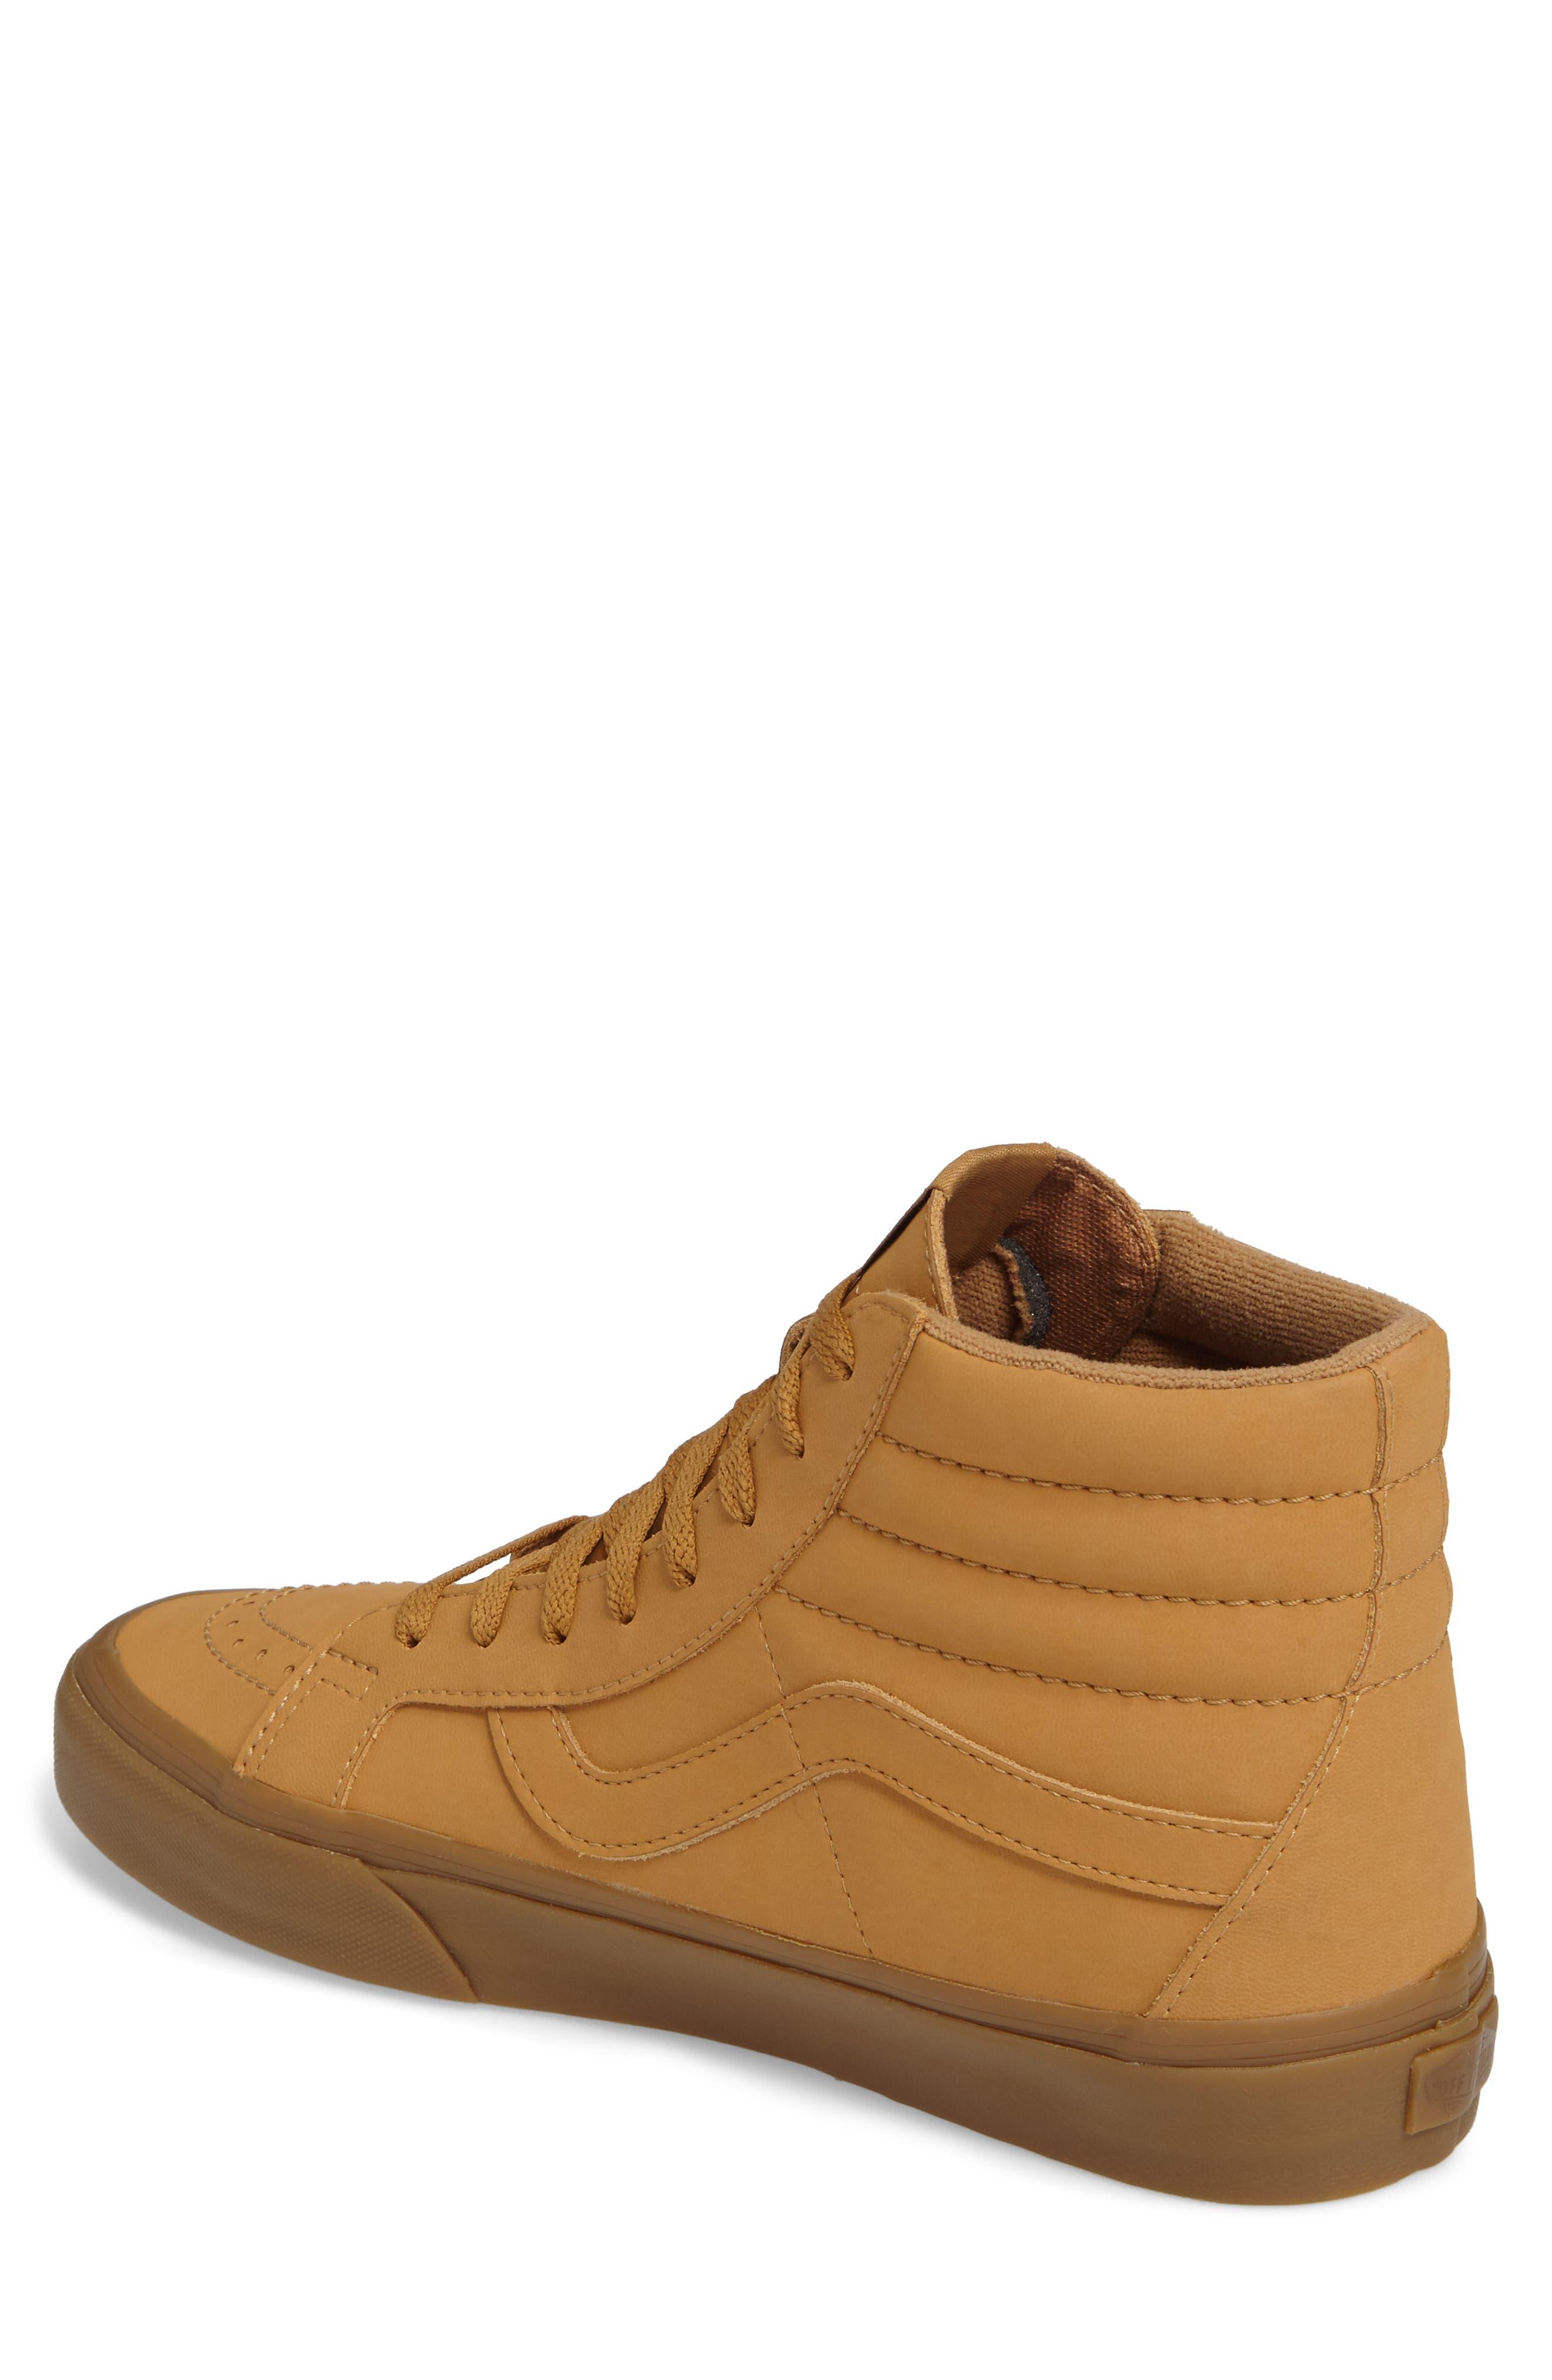 'Sk8-Hi Reissue' Sneaker,                             Alternate thumbnail 2, color,                             Light Gum/ Mono Canvas/Leather